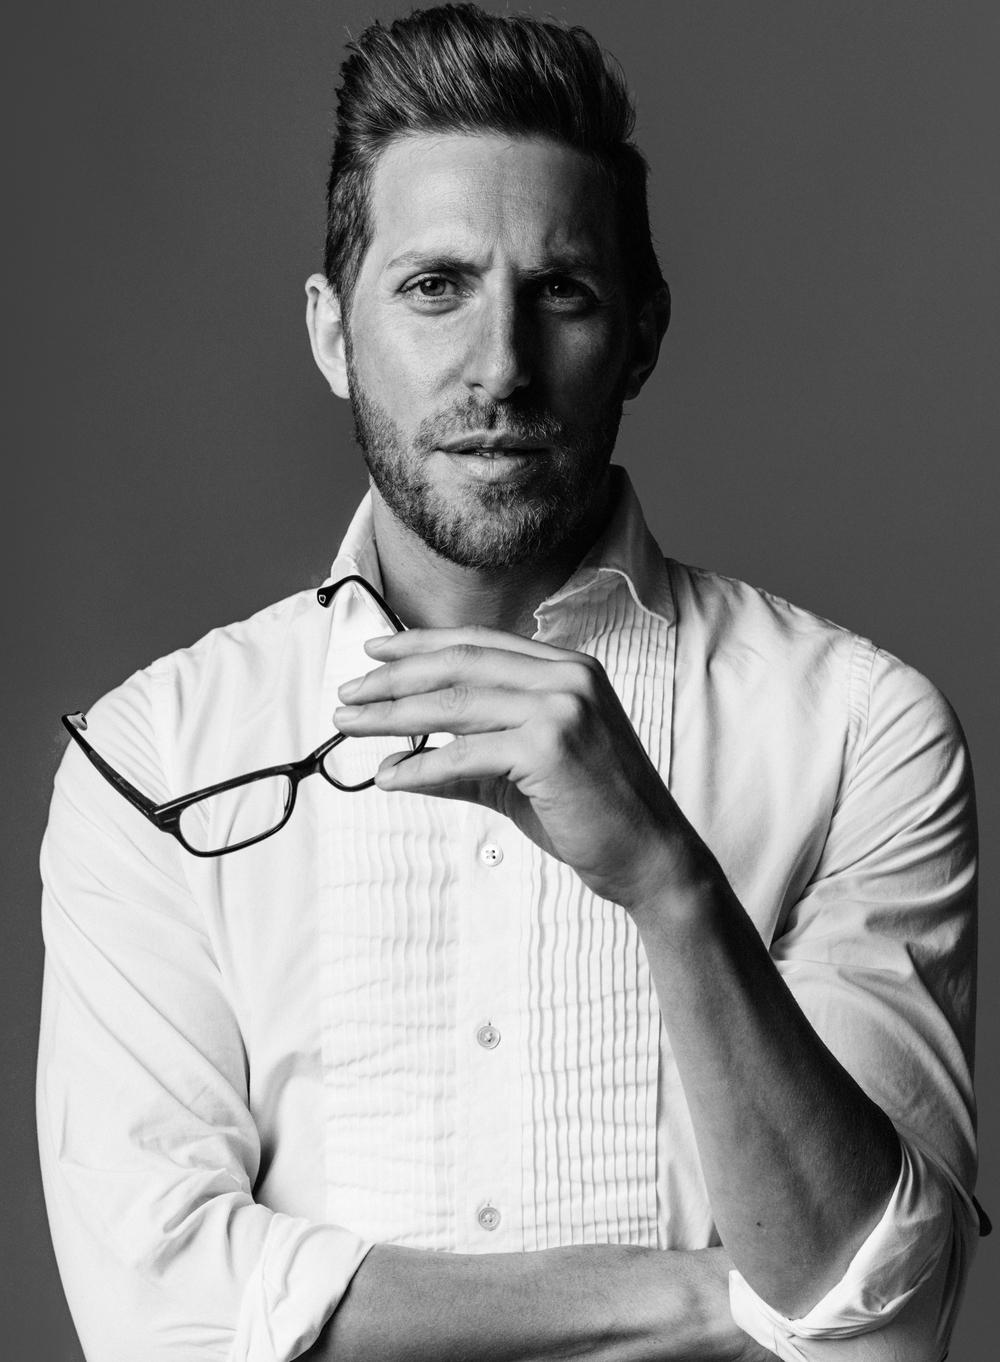 CEO-portrait-corporate-headshot-06.jpg